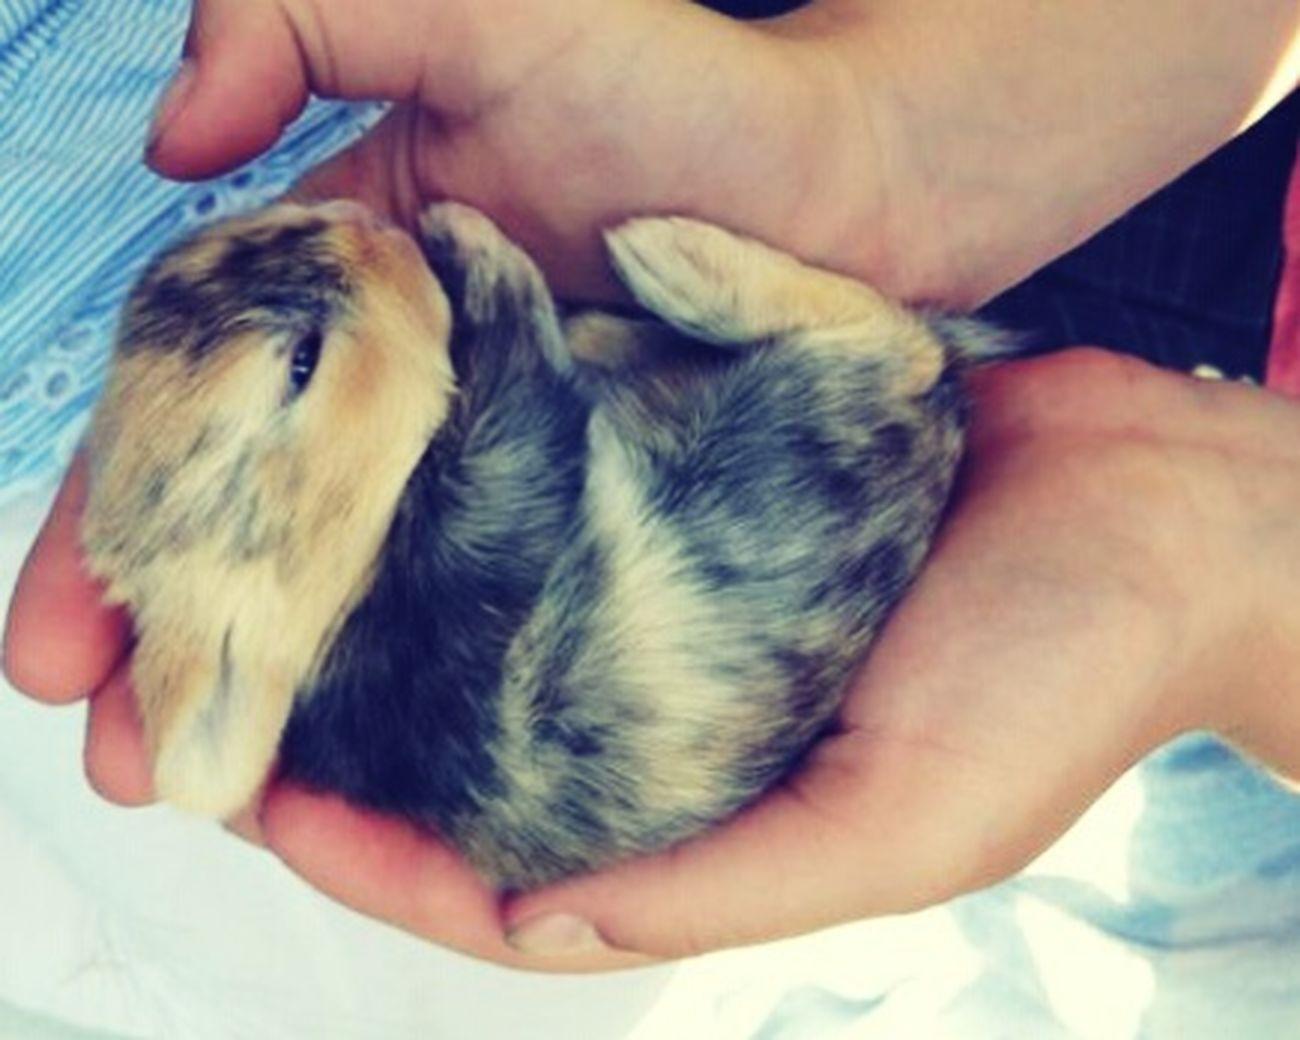 Winzig Klassiker Tiere BabyPet Hasi♥ Hasi Häschen Hasen Süß *__* Süßi :* Süßi❤️